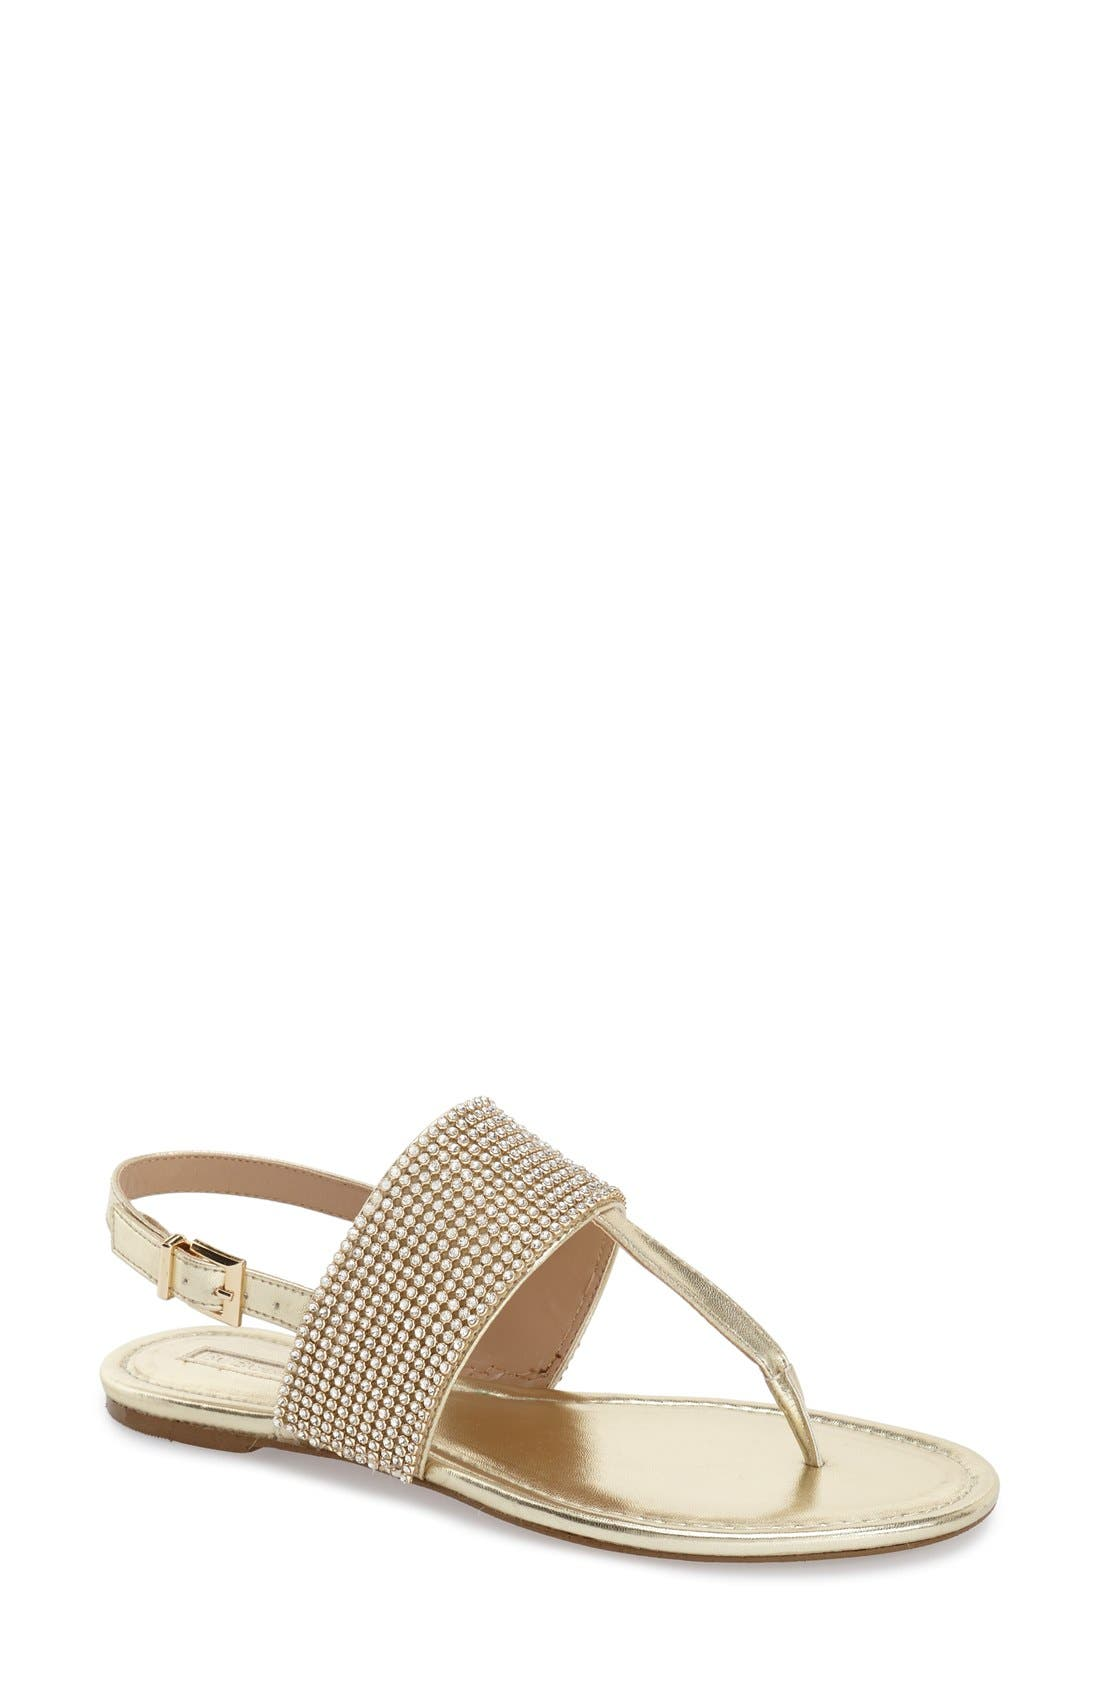 Alternate Image 1 Selected - BCBGeneration 'Wander' Embellished Flat Sandal (Women)